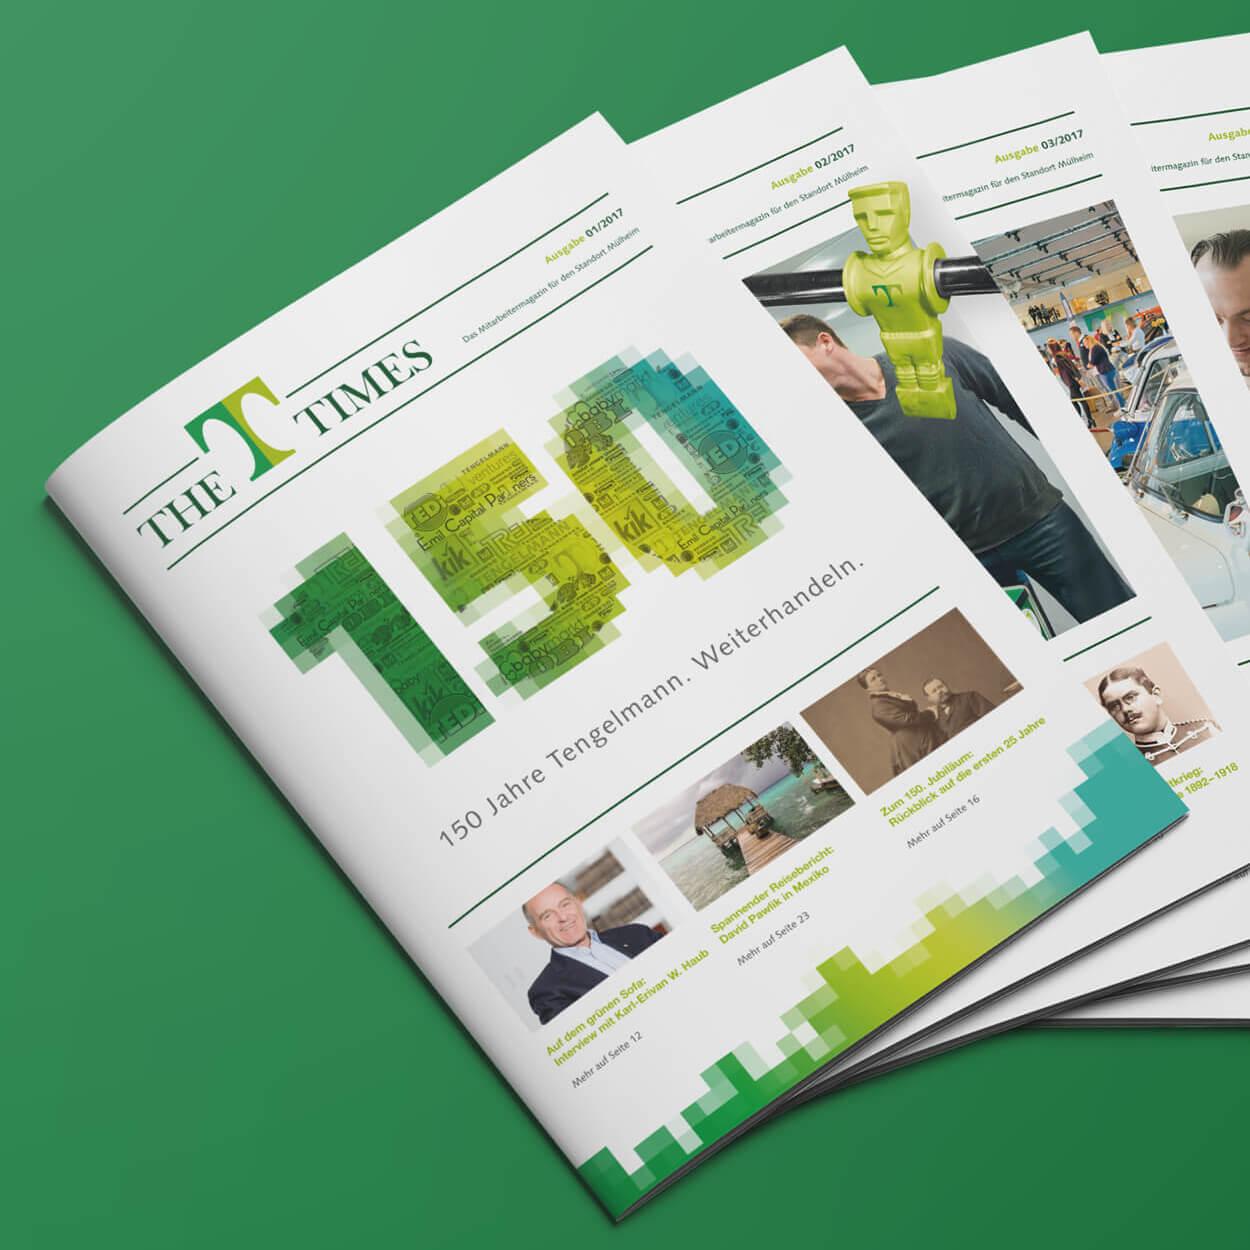 Corporate Publishing, Magazingestaltung für Mitarbeitermagazin von der 31M Corporate Publishing Agentur